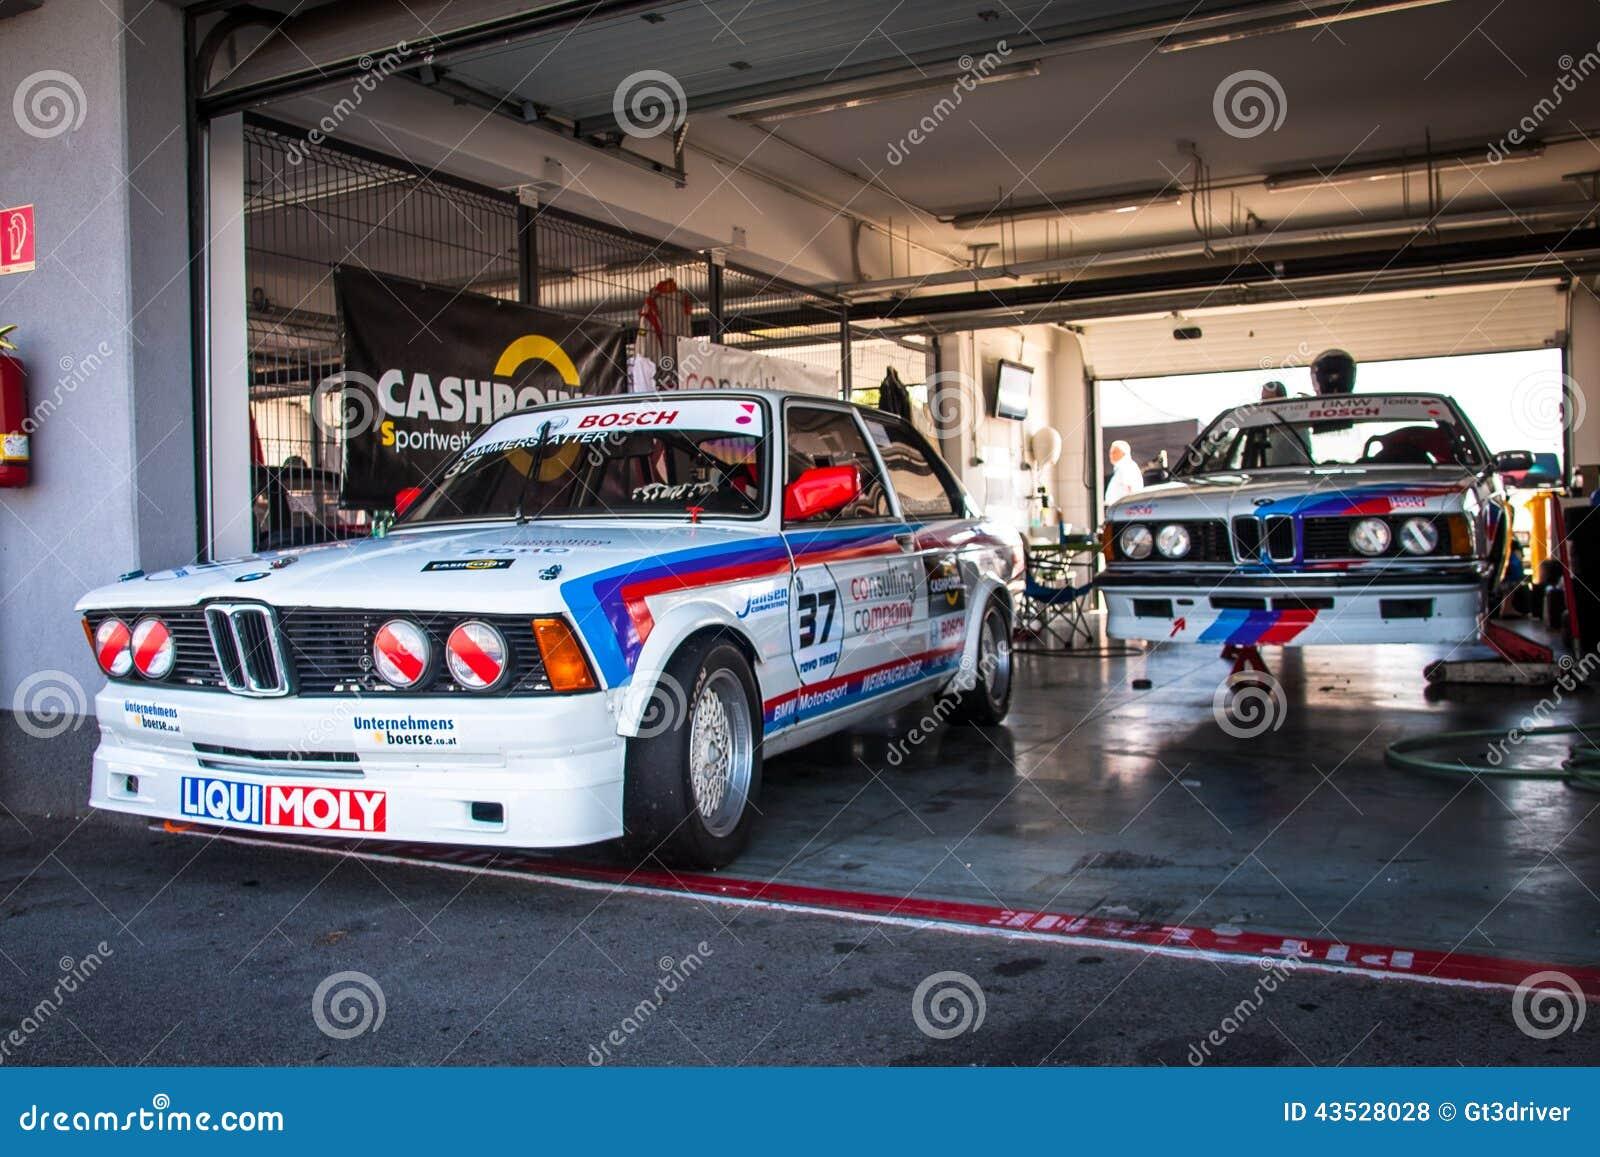 Classic Bmw Racing Cars Editorial Stock Photo Image